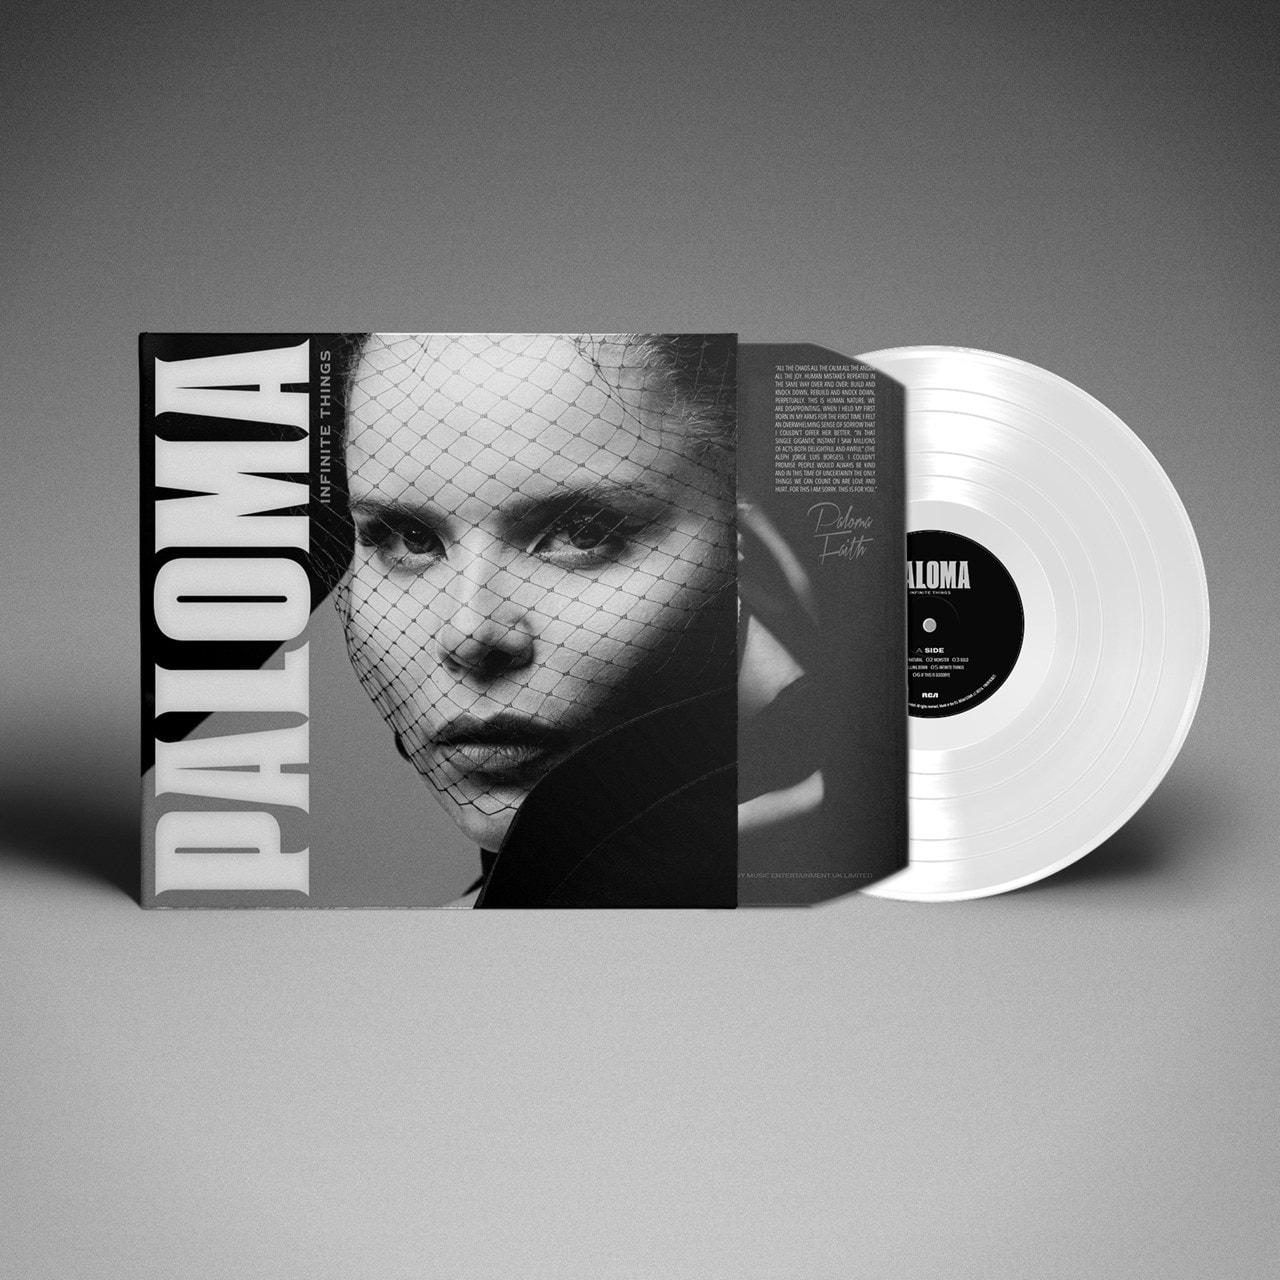 Paloma Faith - Infinite Things Limited Edition White Vinyl